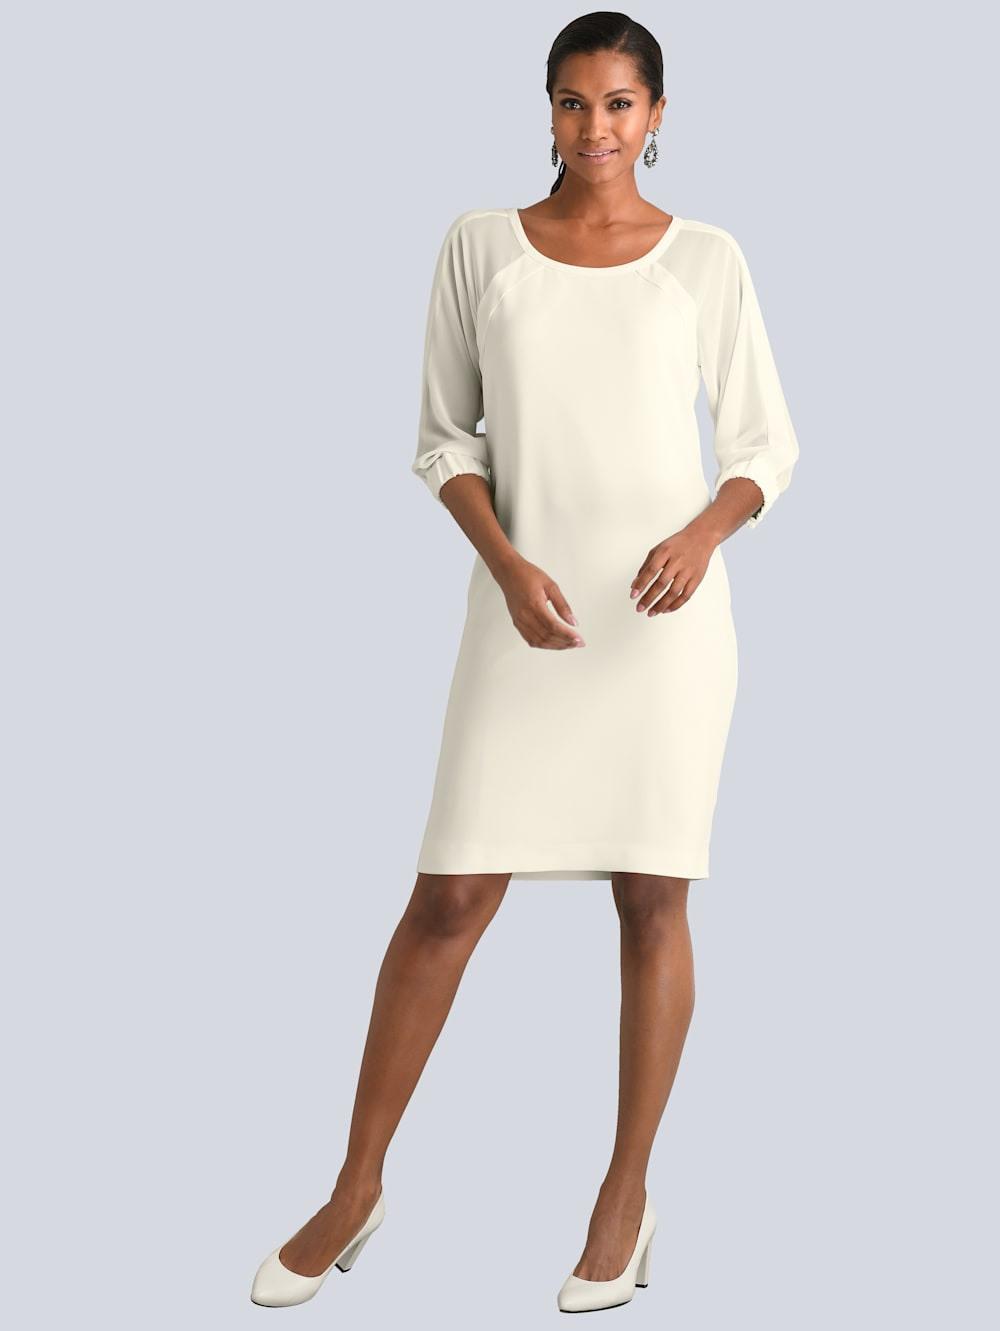 Alba Moda Kleid Mit Transparenten Chiffonärmeln  Alba Moda